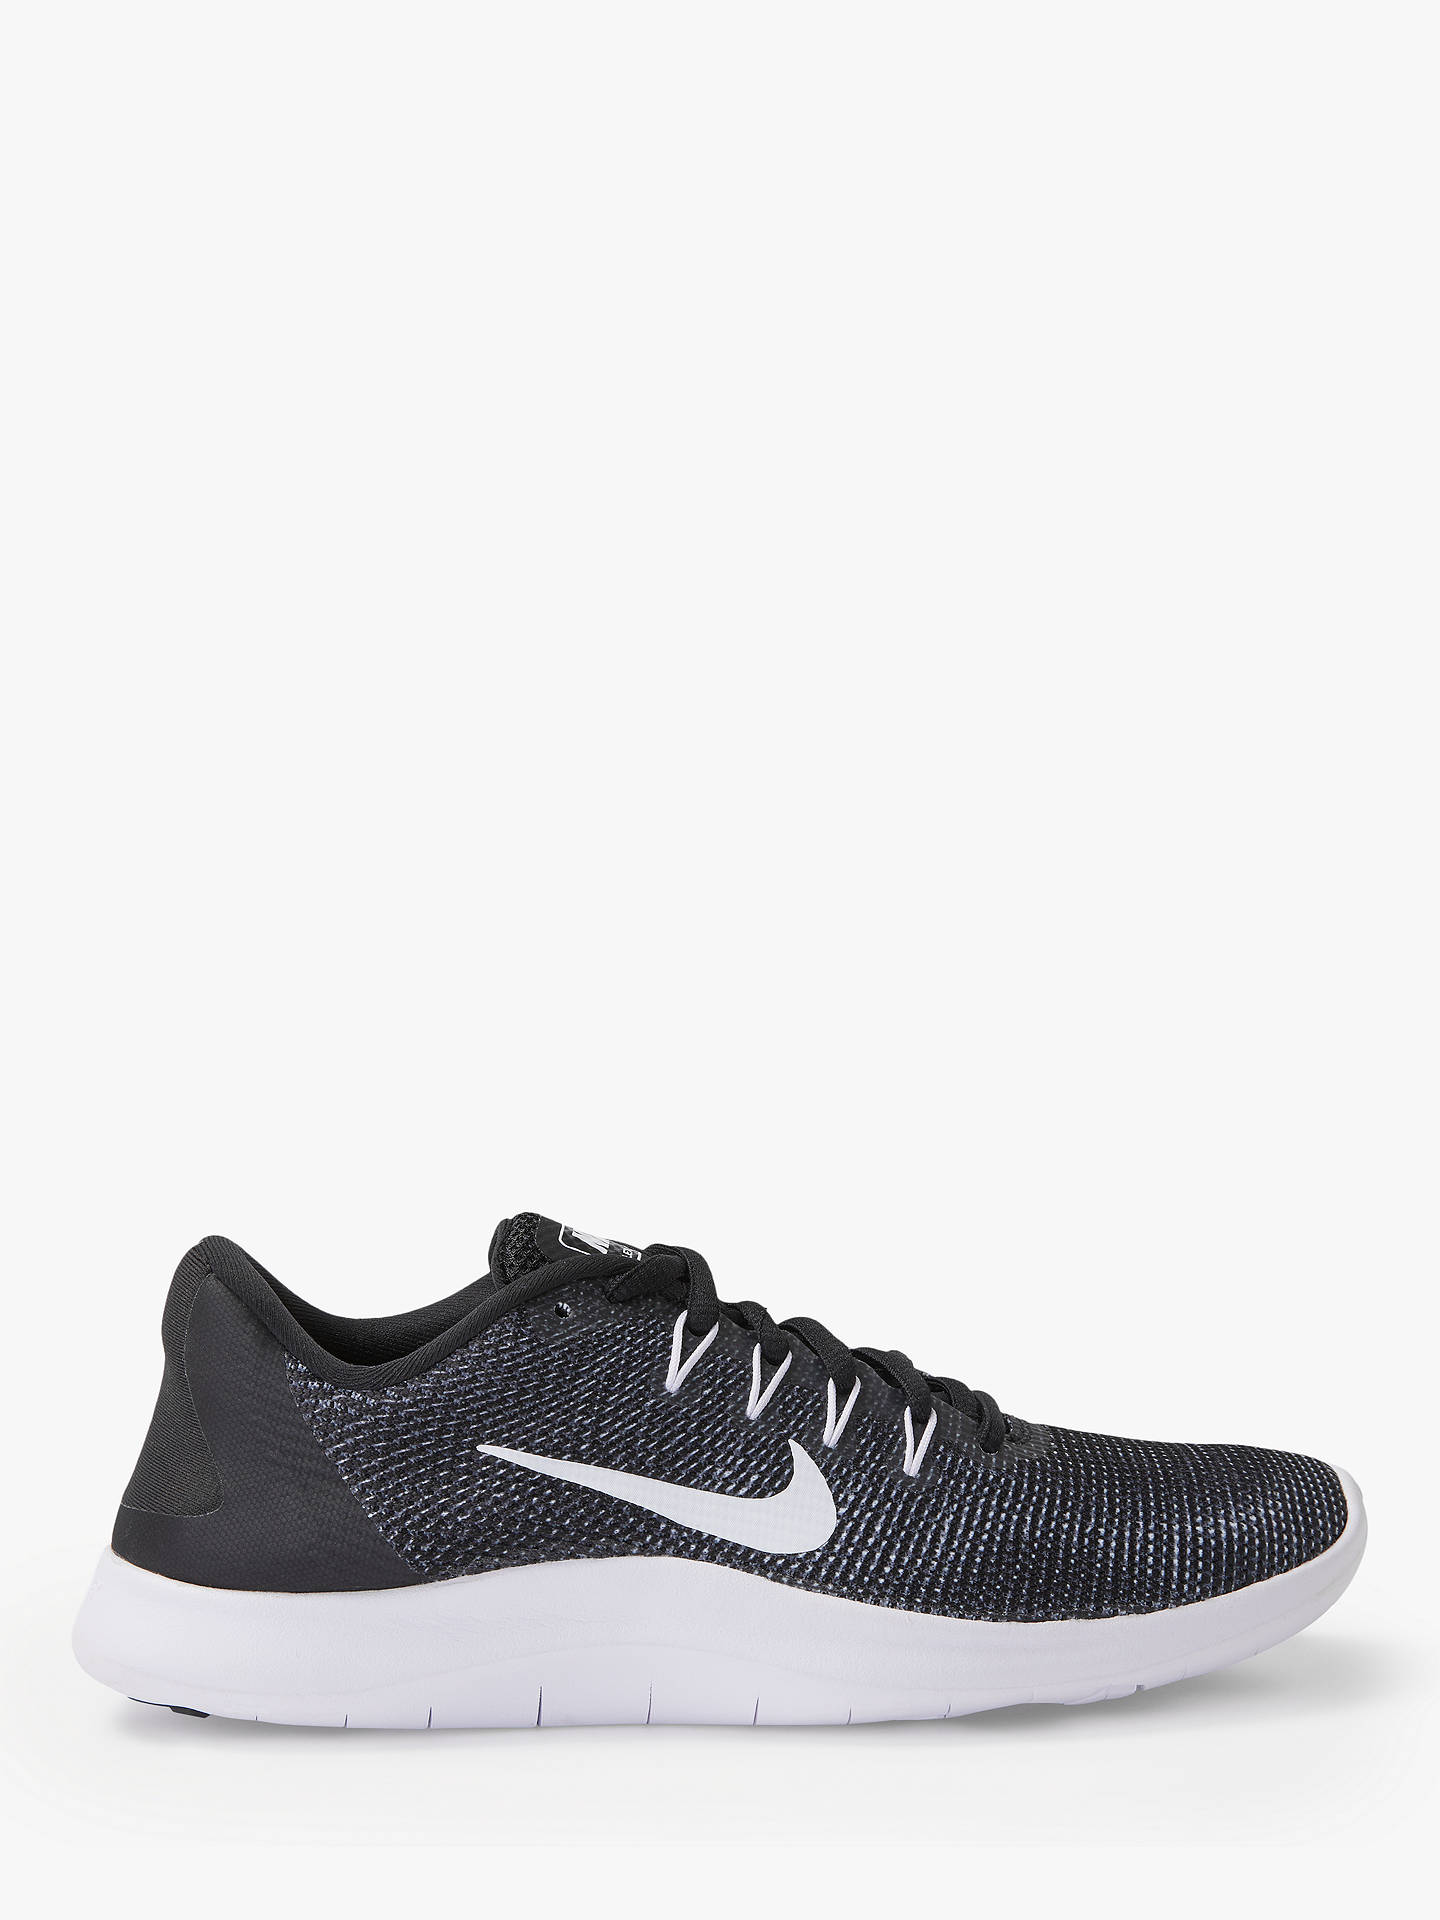 Nike Flex 2017 RN Women's Running Shoes at John Lewis & Partners